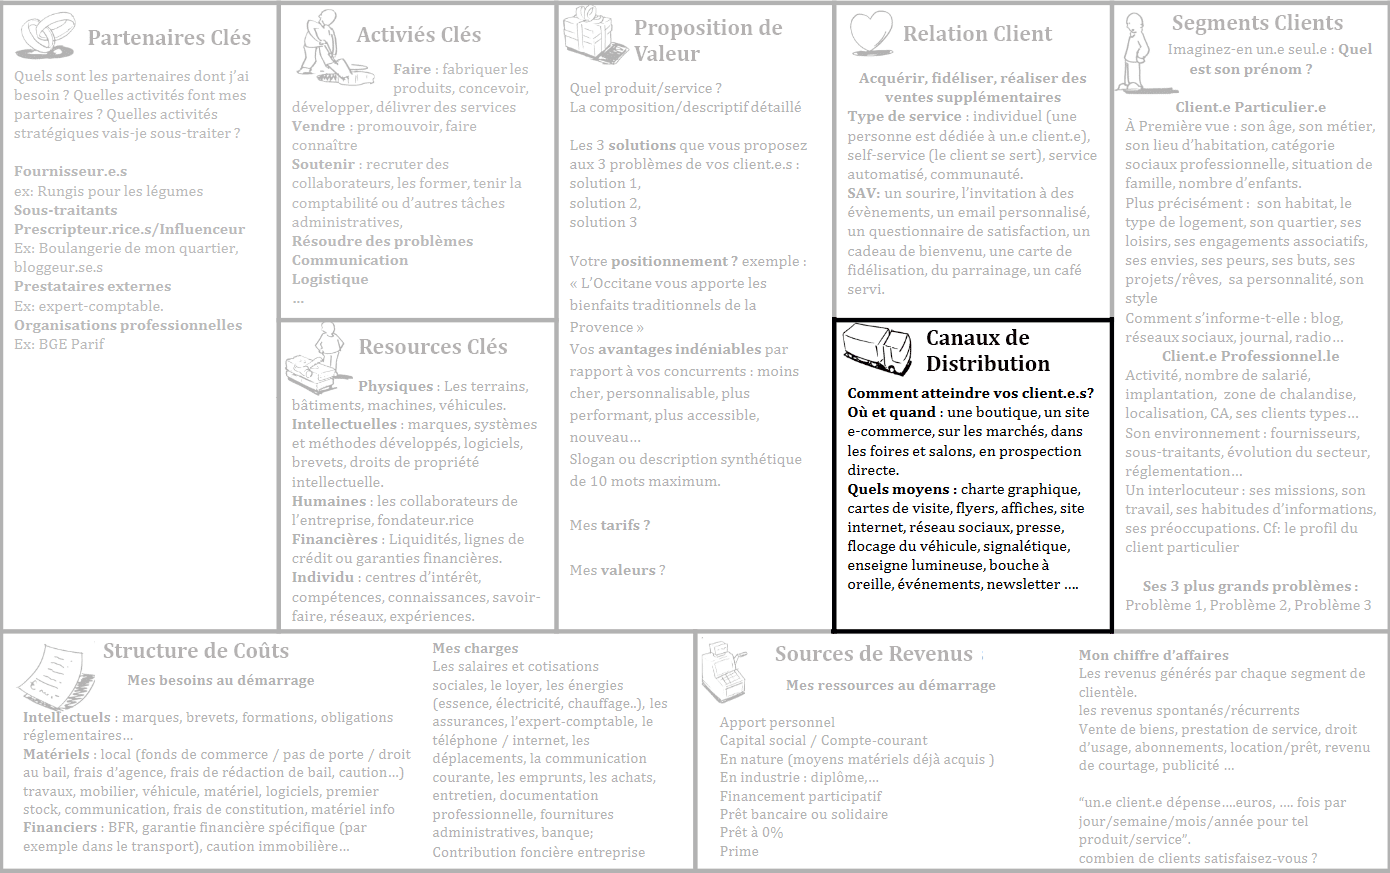 Business-model-canvas-tableau-canaux-distribution